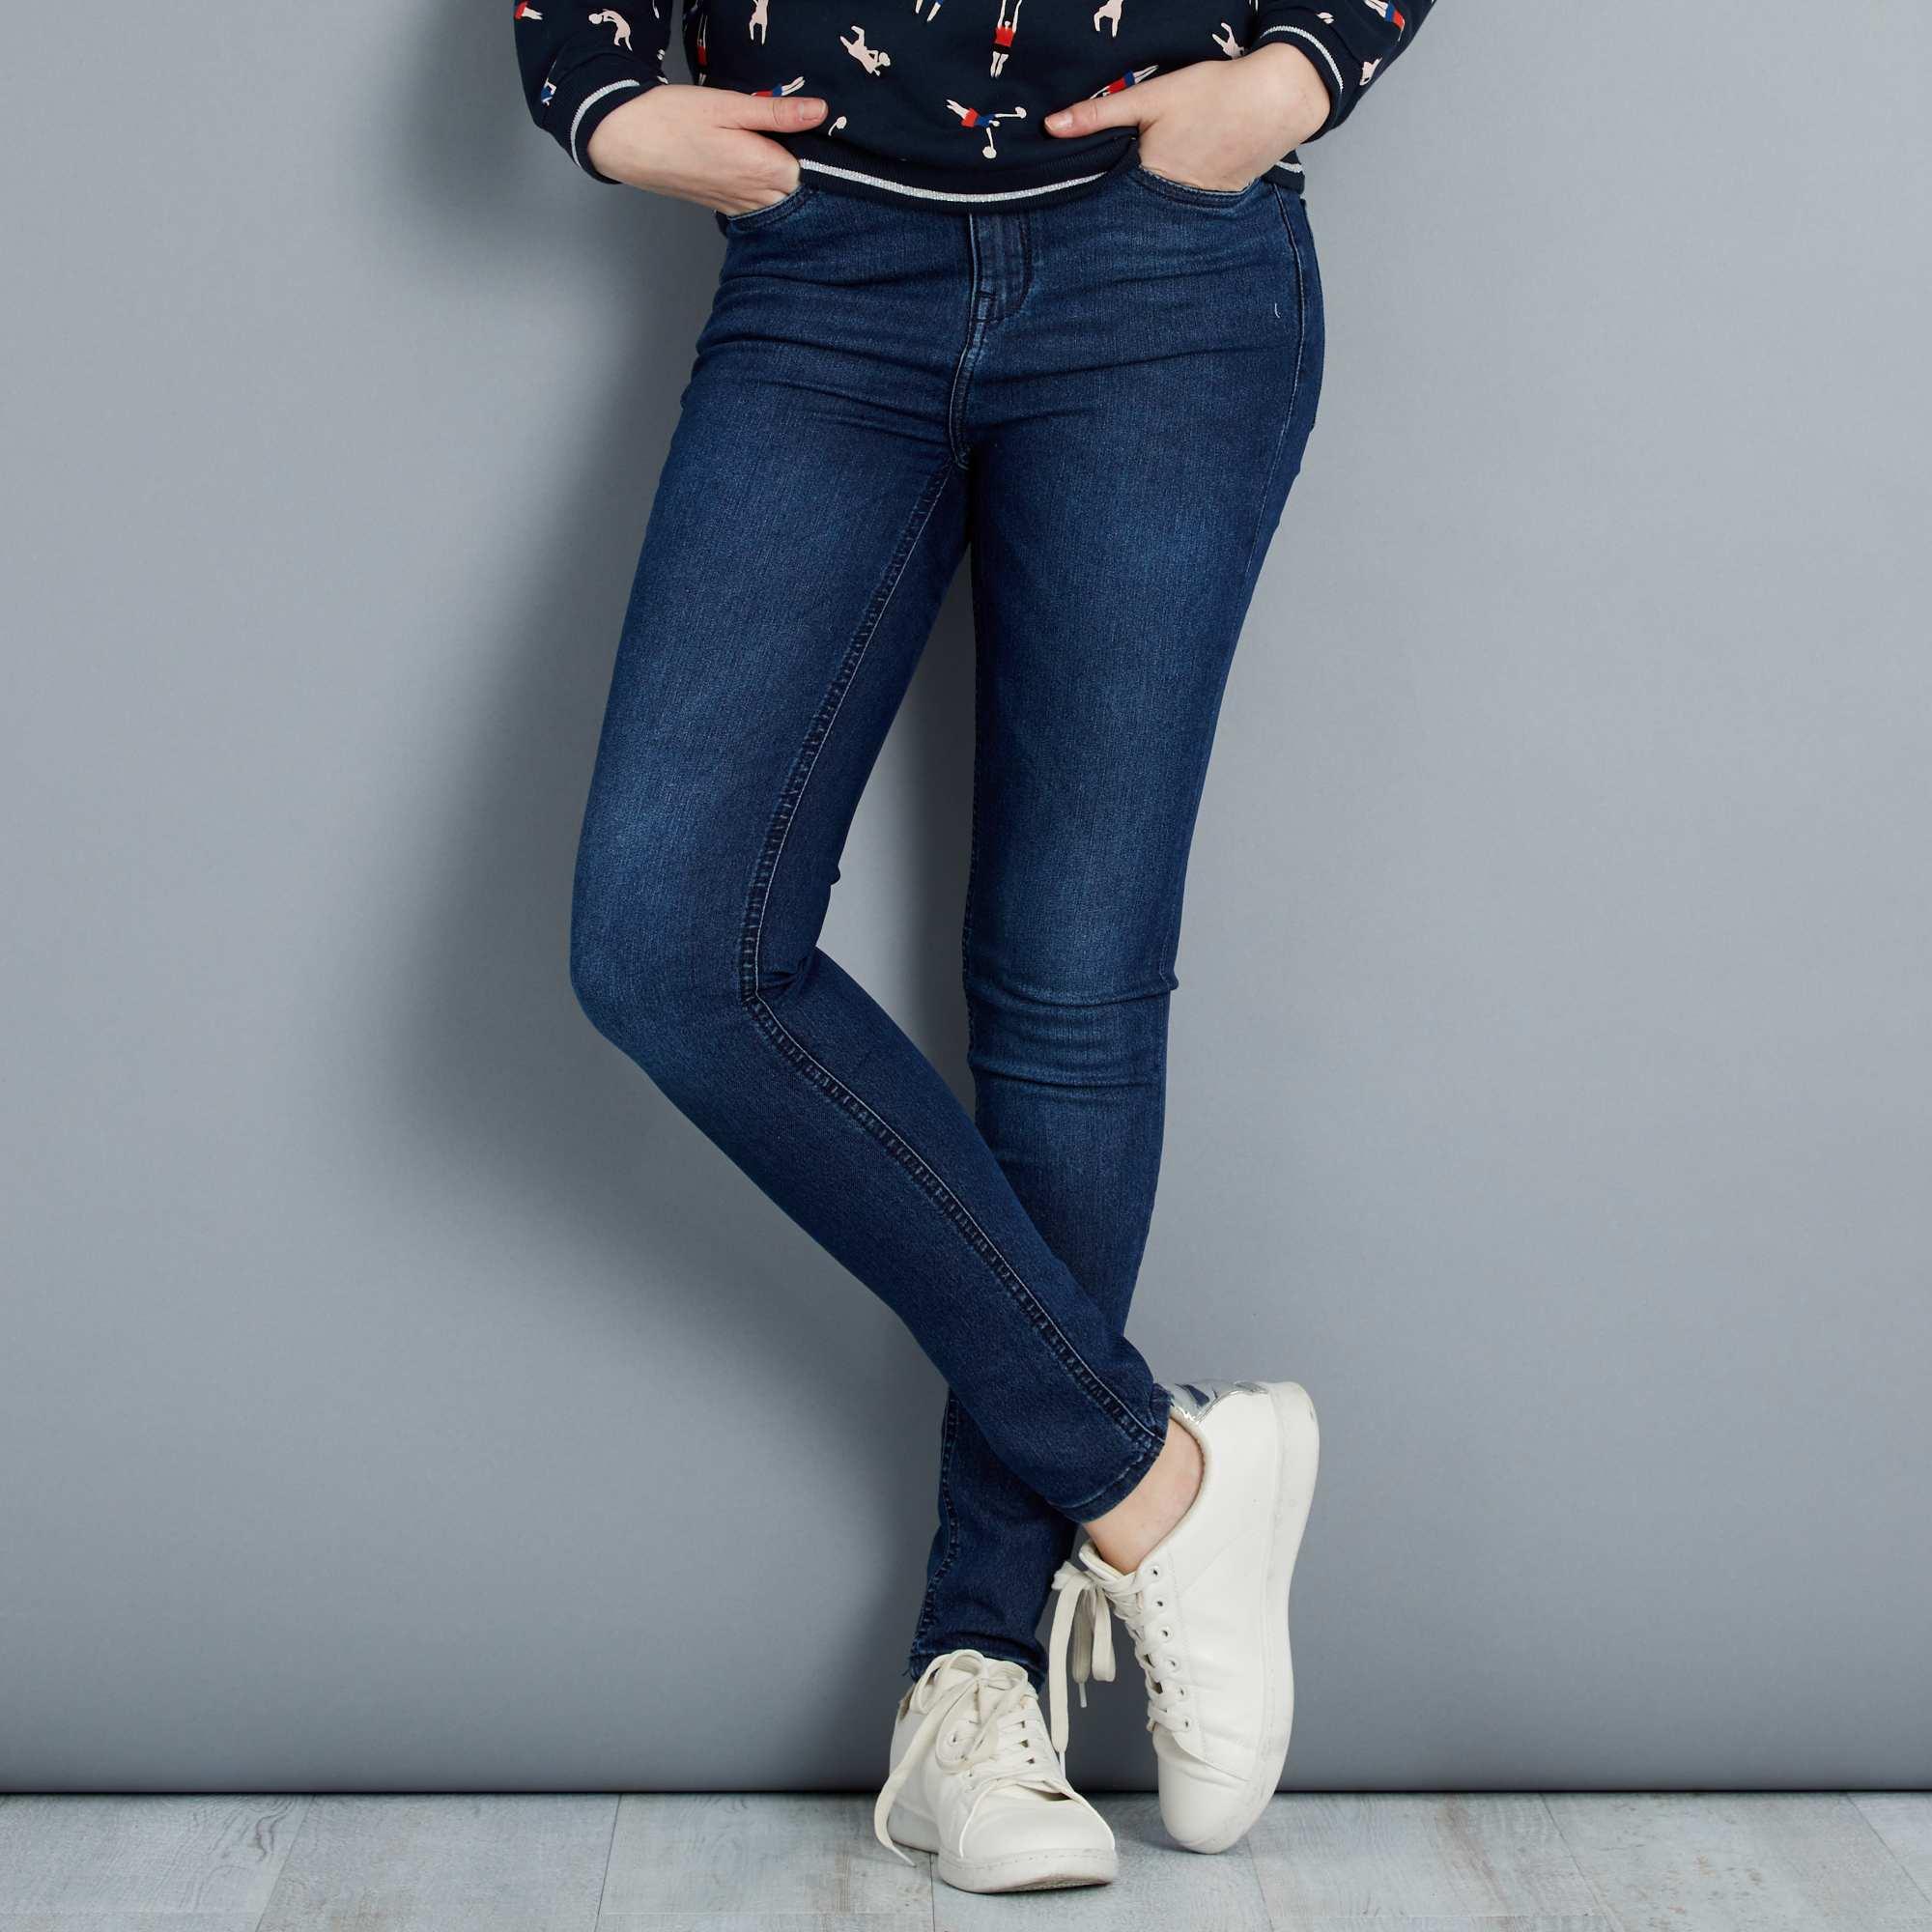 jean skinny taille haute longueur us 30 femme bleu. Black Bedroom Furniture Sets. Home Design Ideas